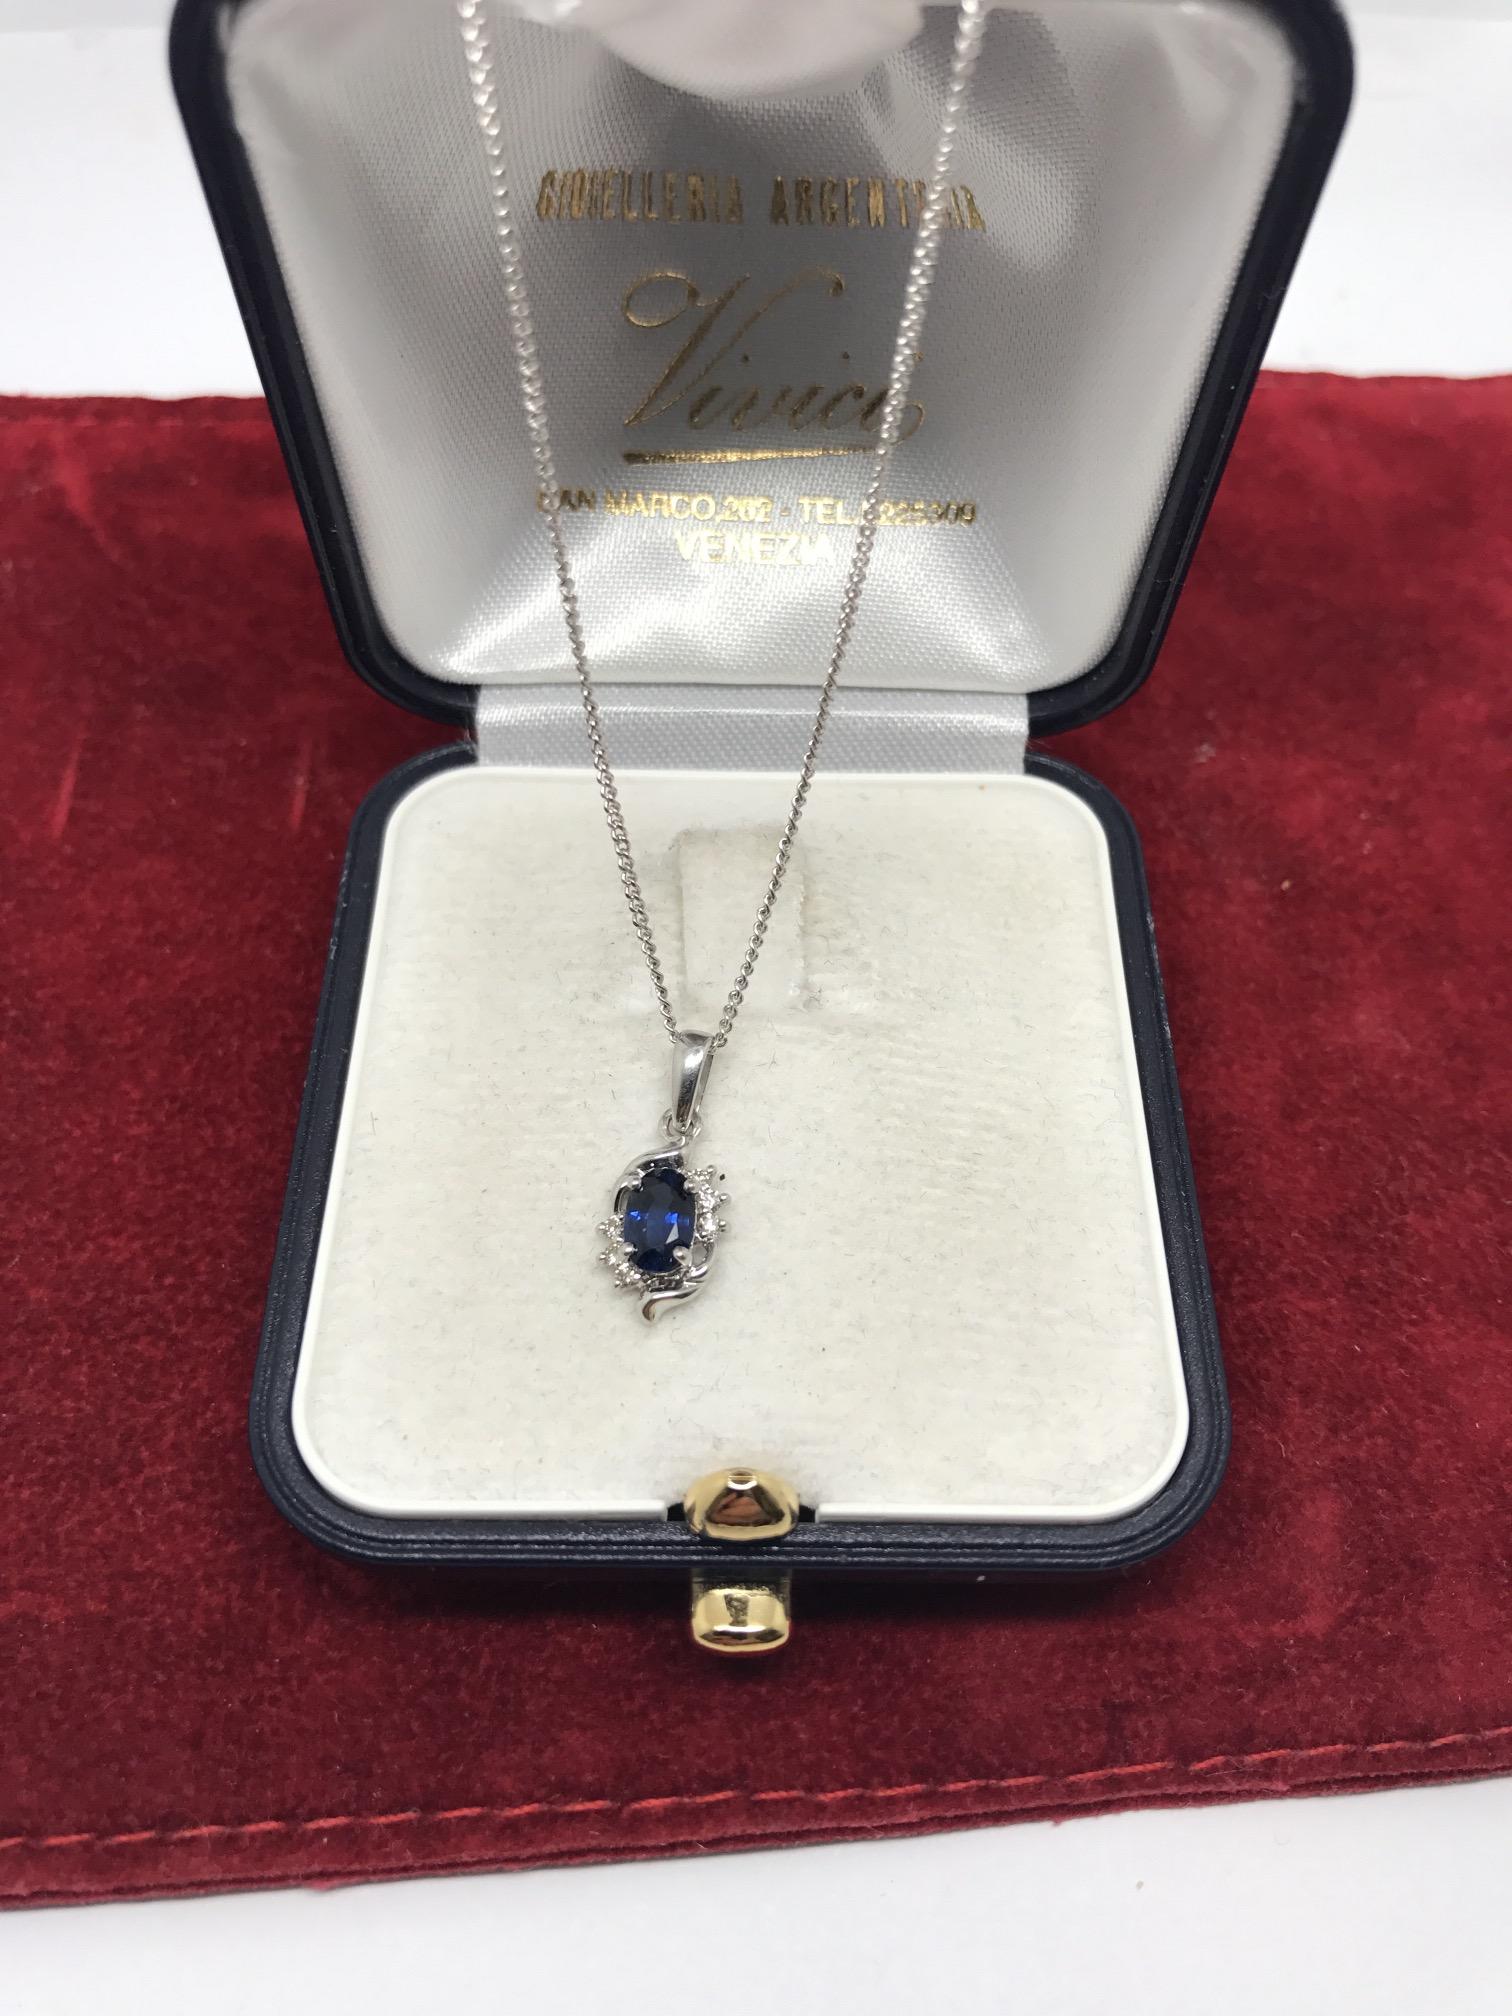 Lot 41 - 18ct WHITE GOLD BLUE SAPPHIRE & DIAMOND PENDANT & CHAIN